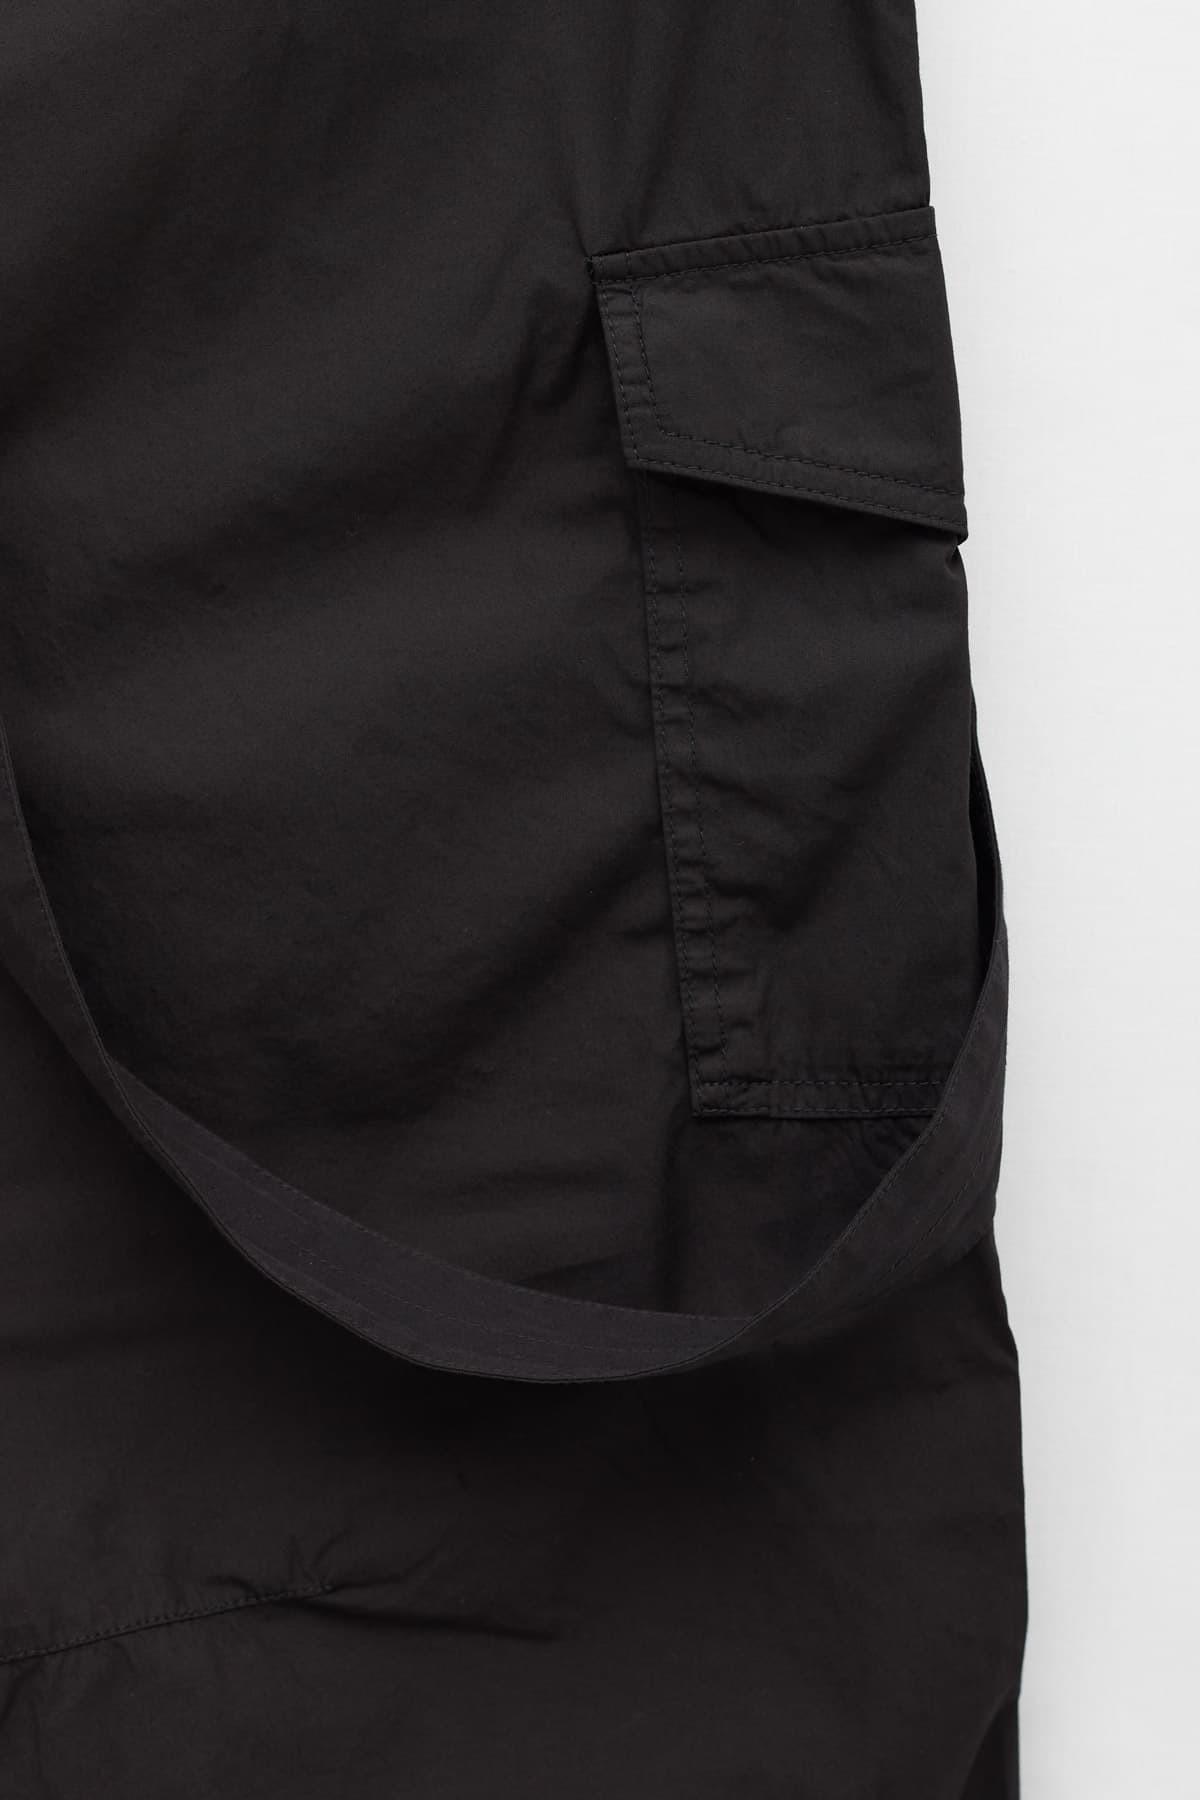 Shop Raf Simons x Eastpak Black Beige America RS Padded Backpack